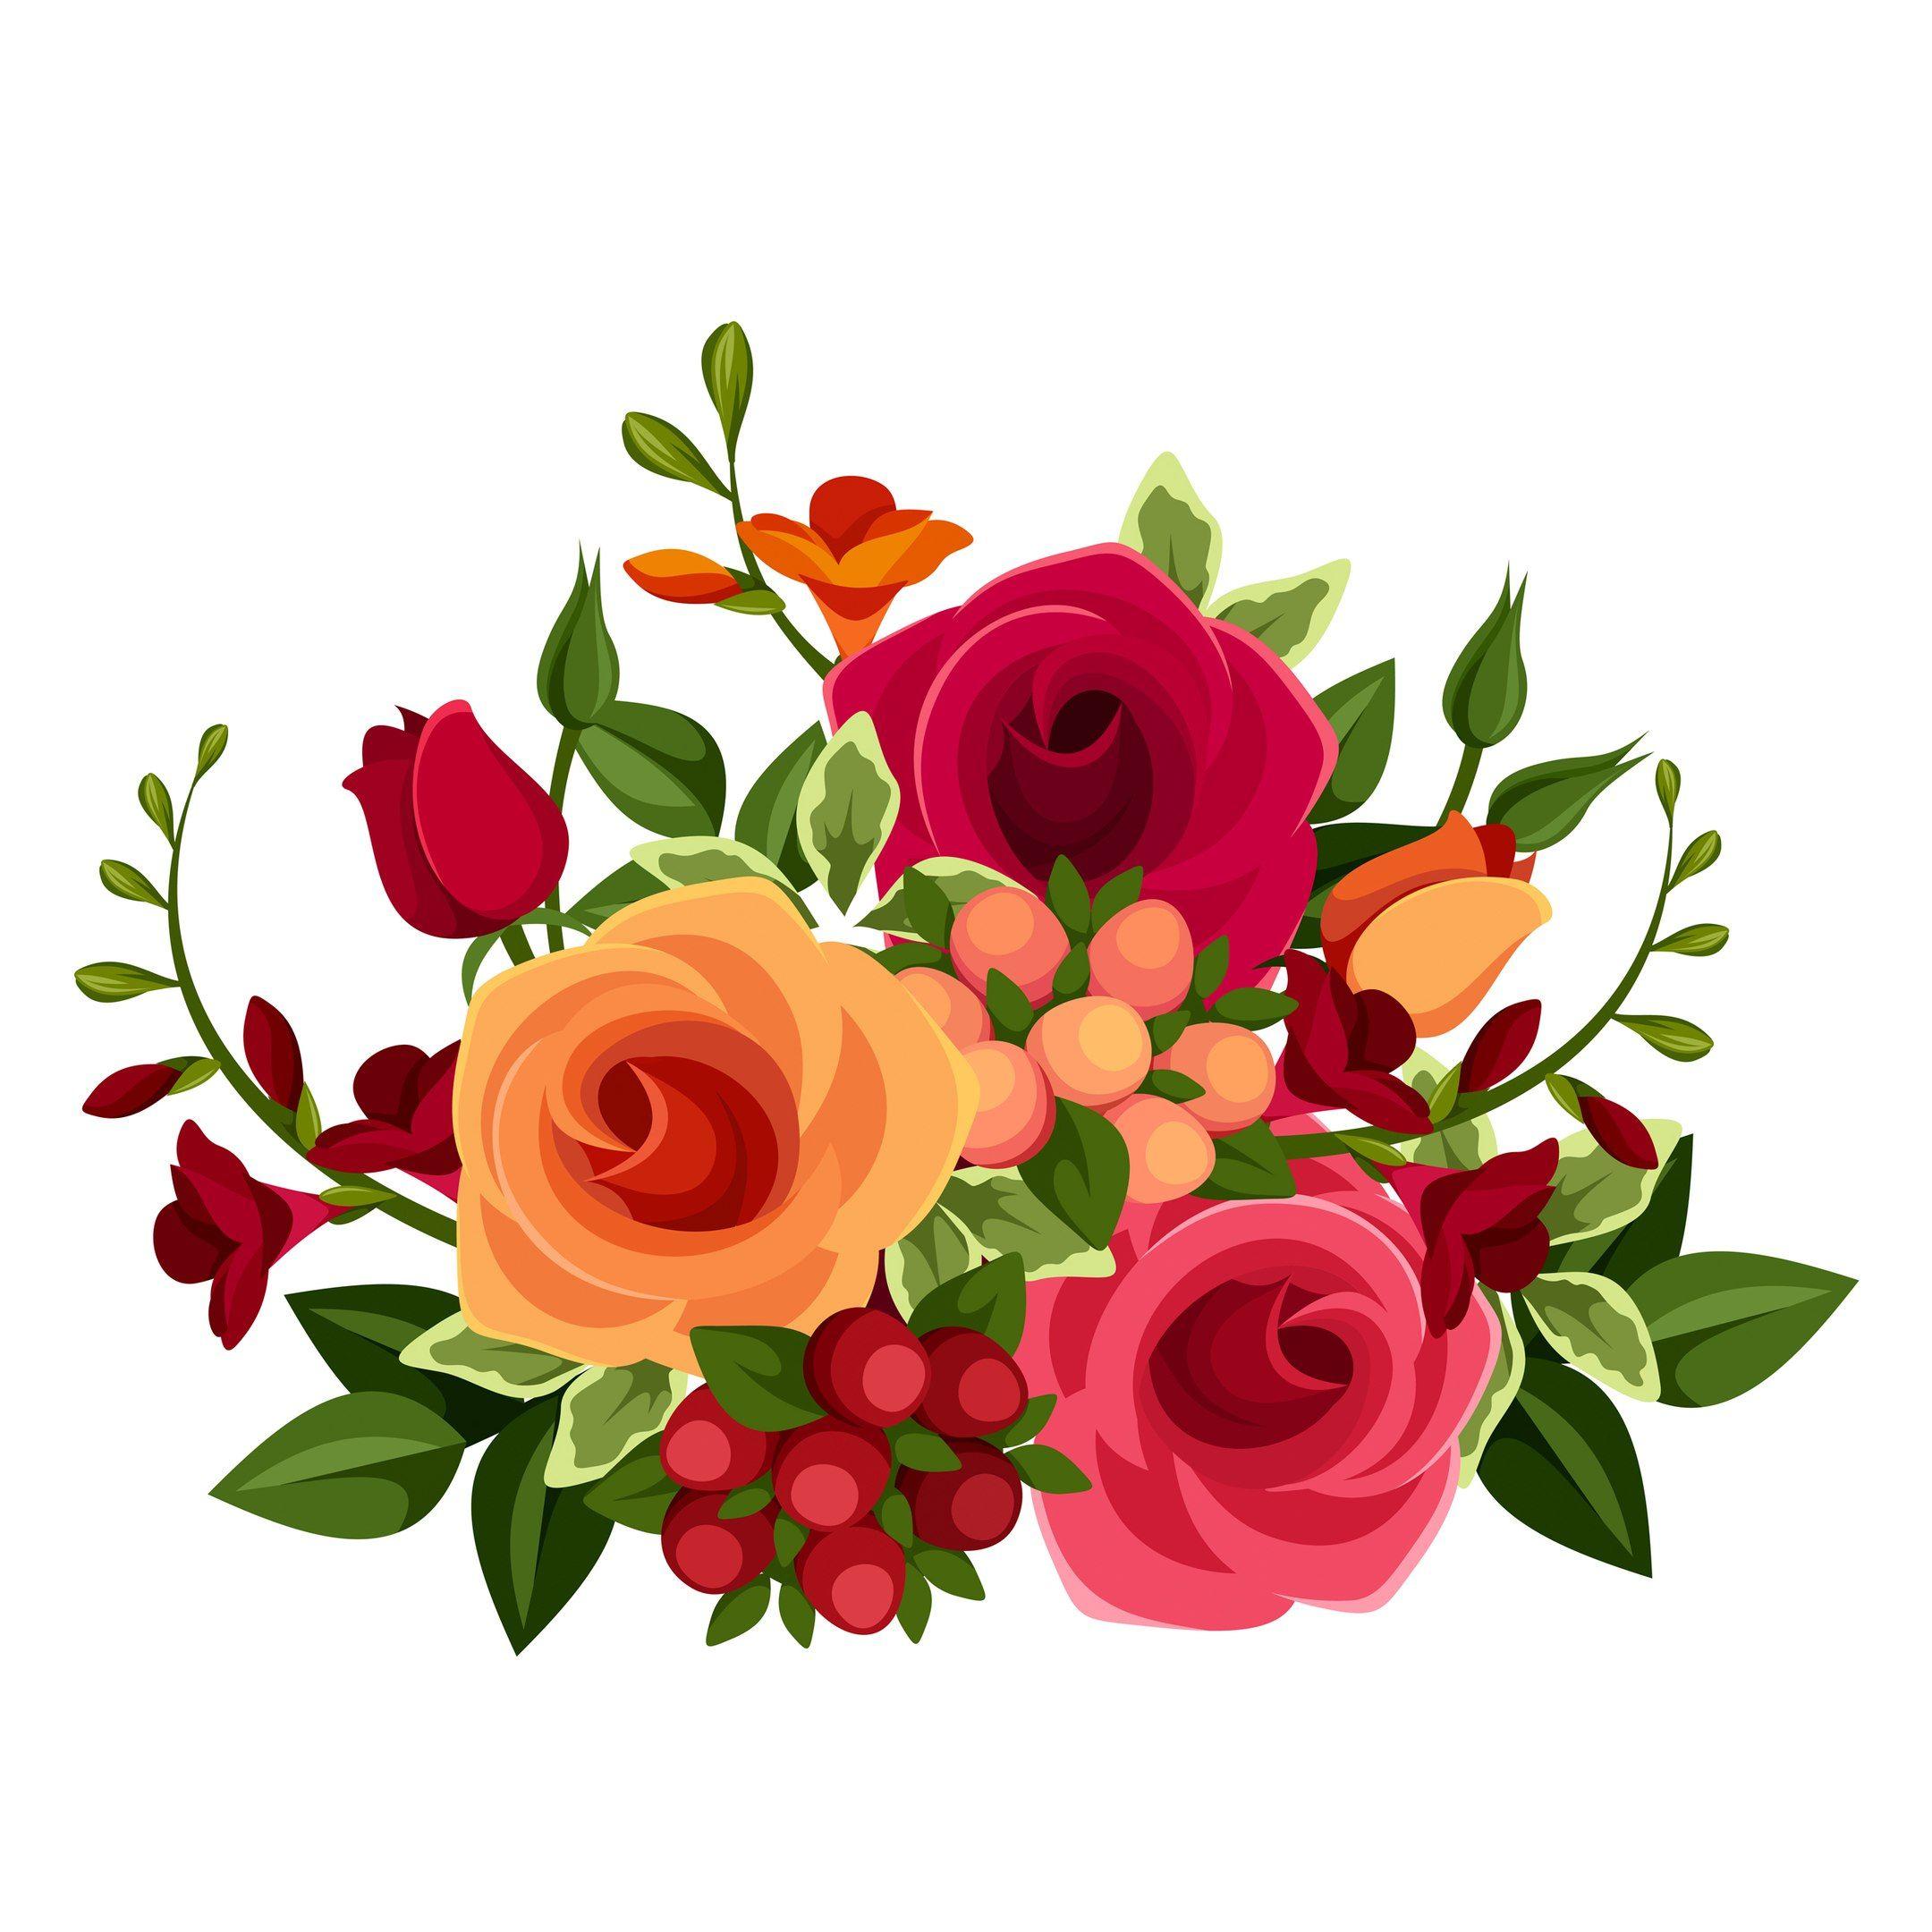 VECTOR, JPEG, PNG, ШРИФТЫ Estampas florais, Unhas